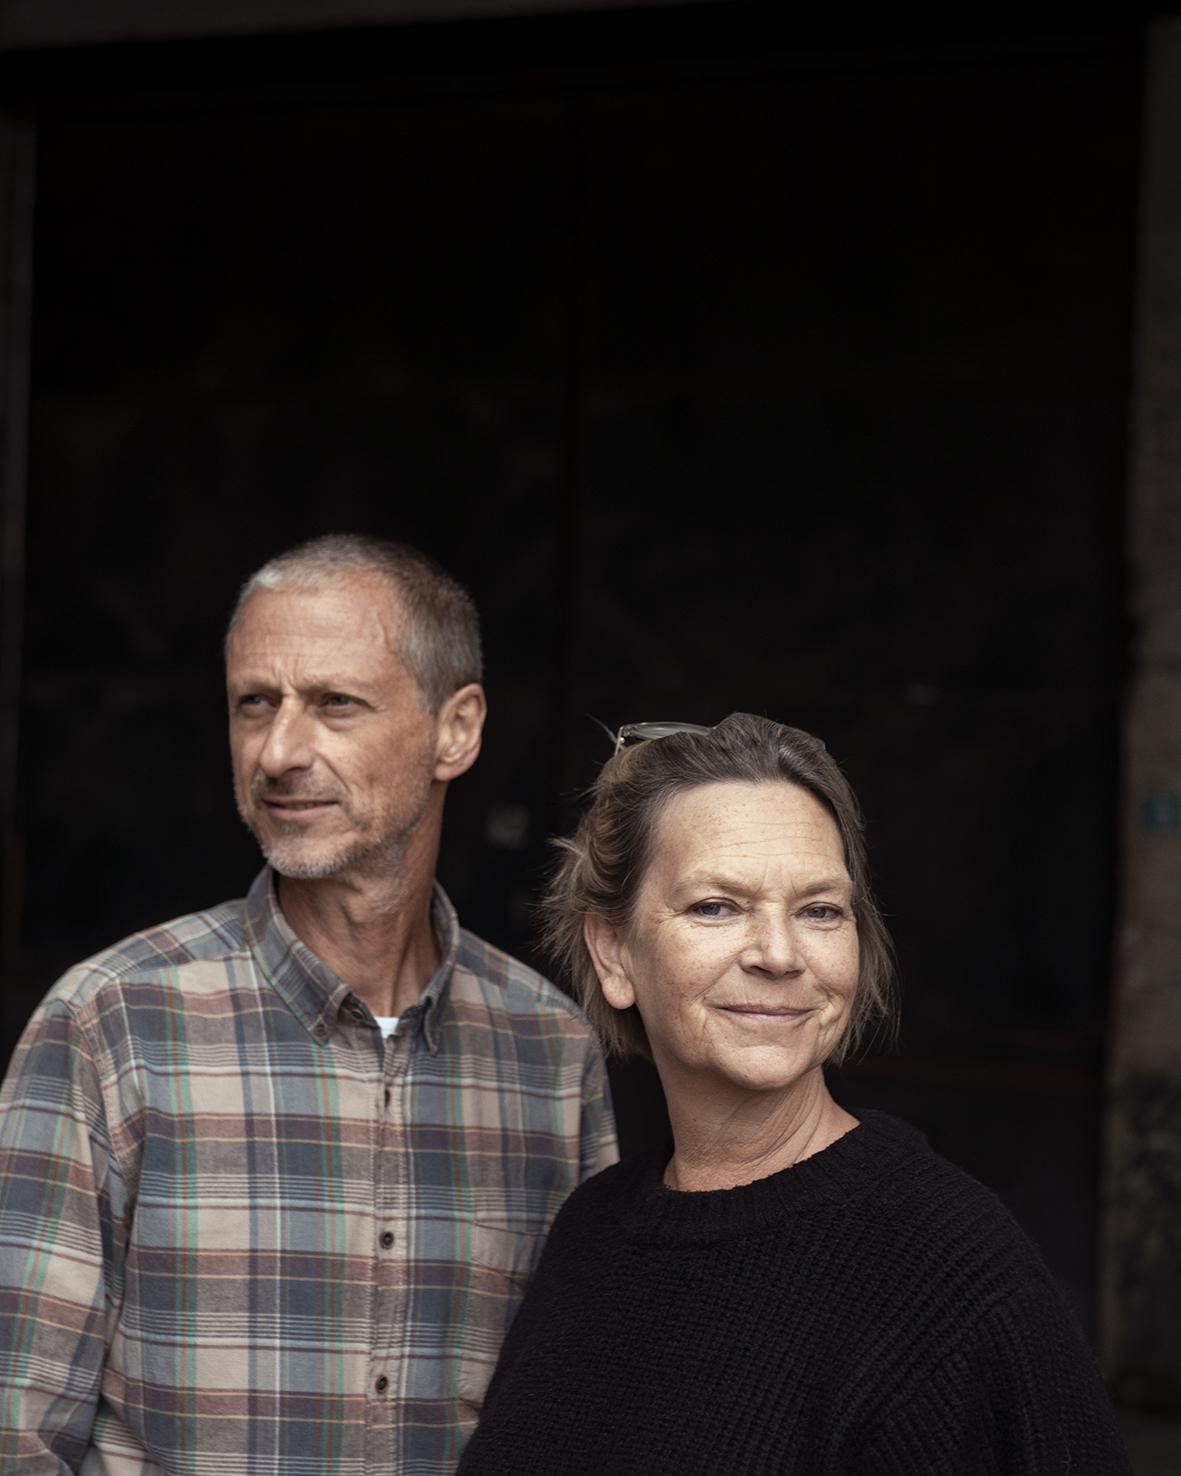 Volmaakt_Portret_Armand&Francine